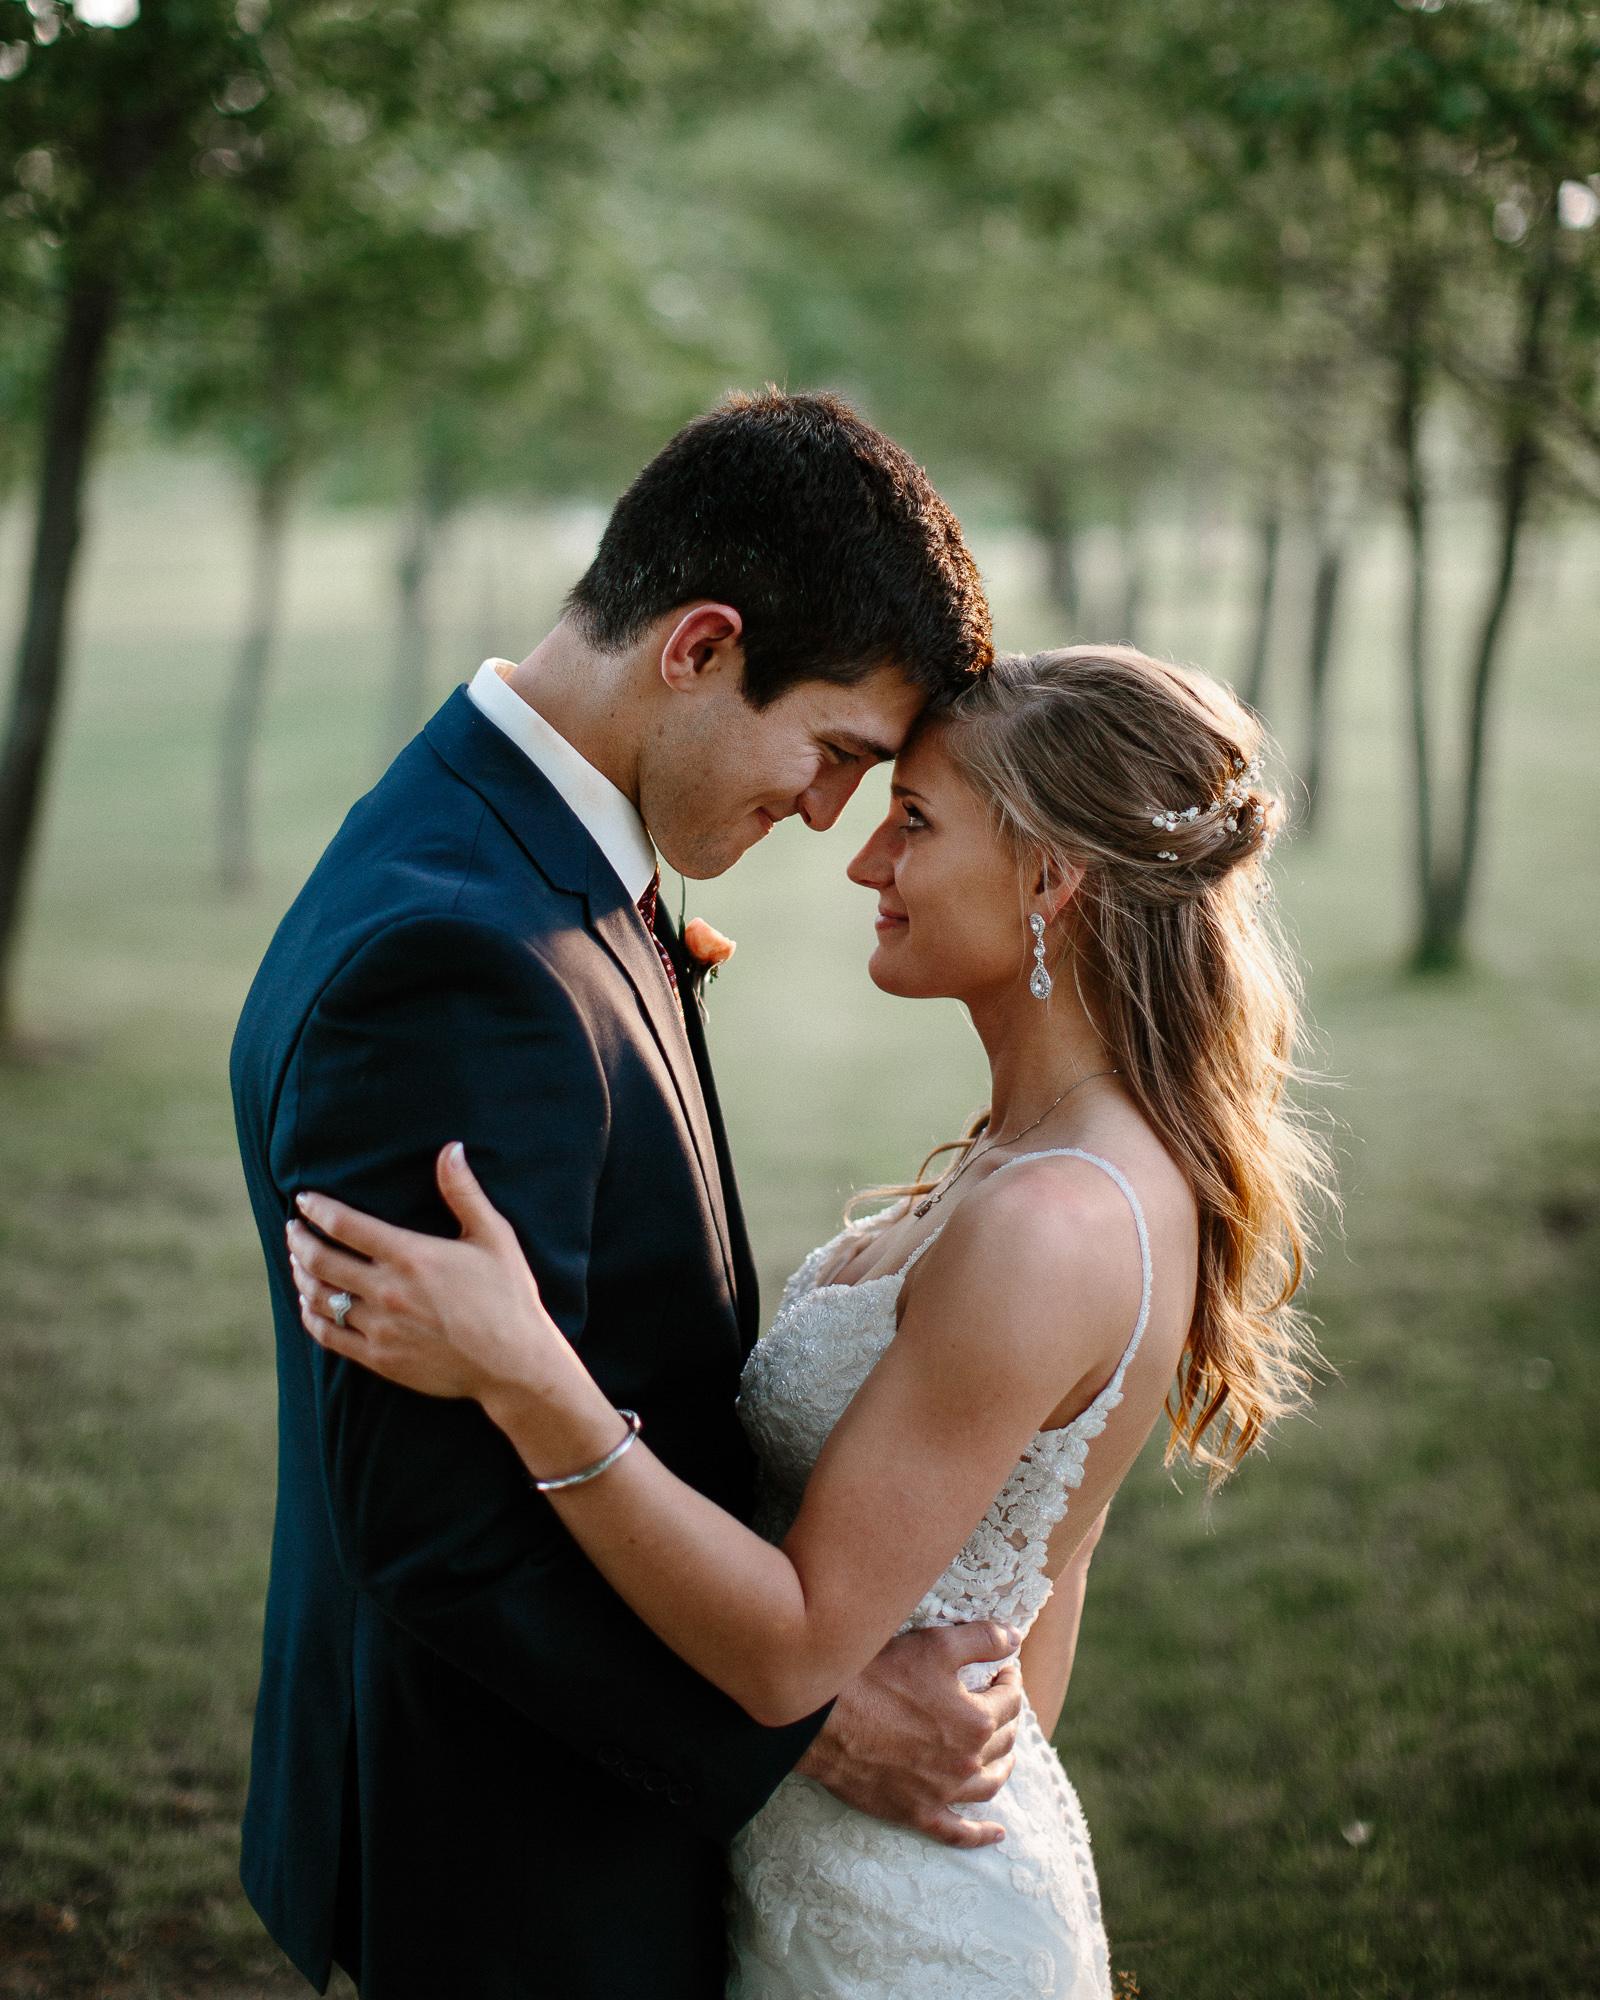 wedding-elopement-adventerous-romantic-timeless-south-dakota-blue-haven-barn-079.jpg